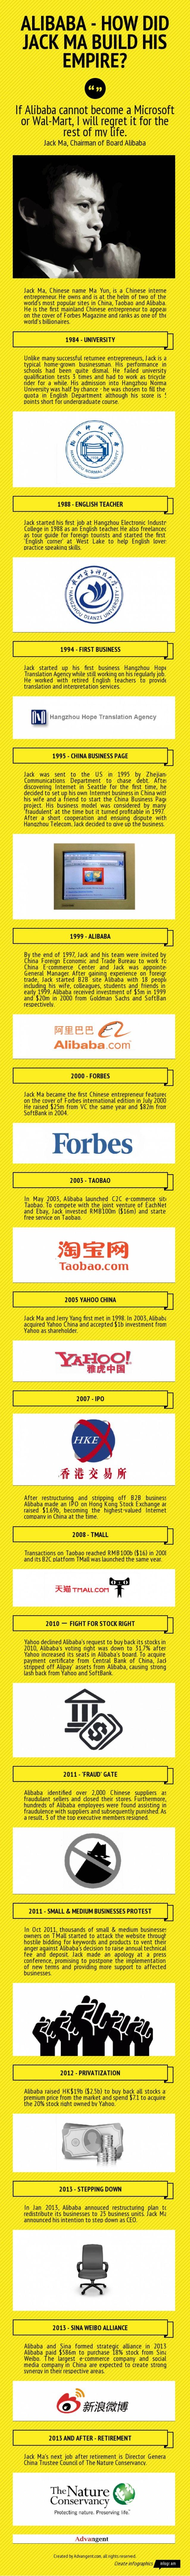 Alibaba - How did jack ma build his empire